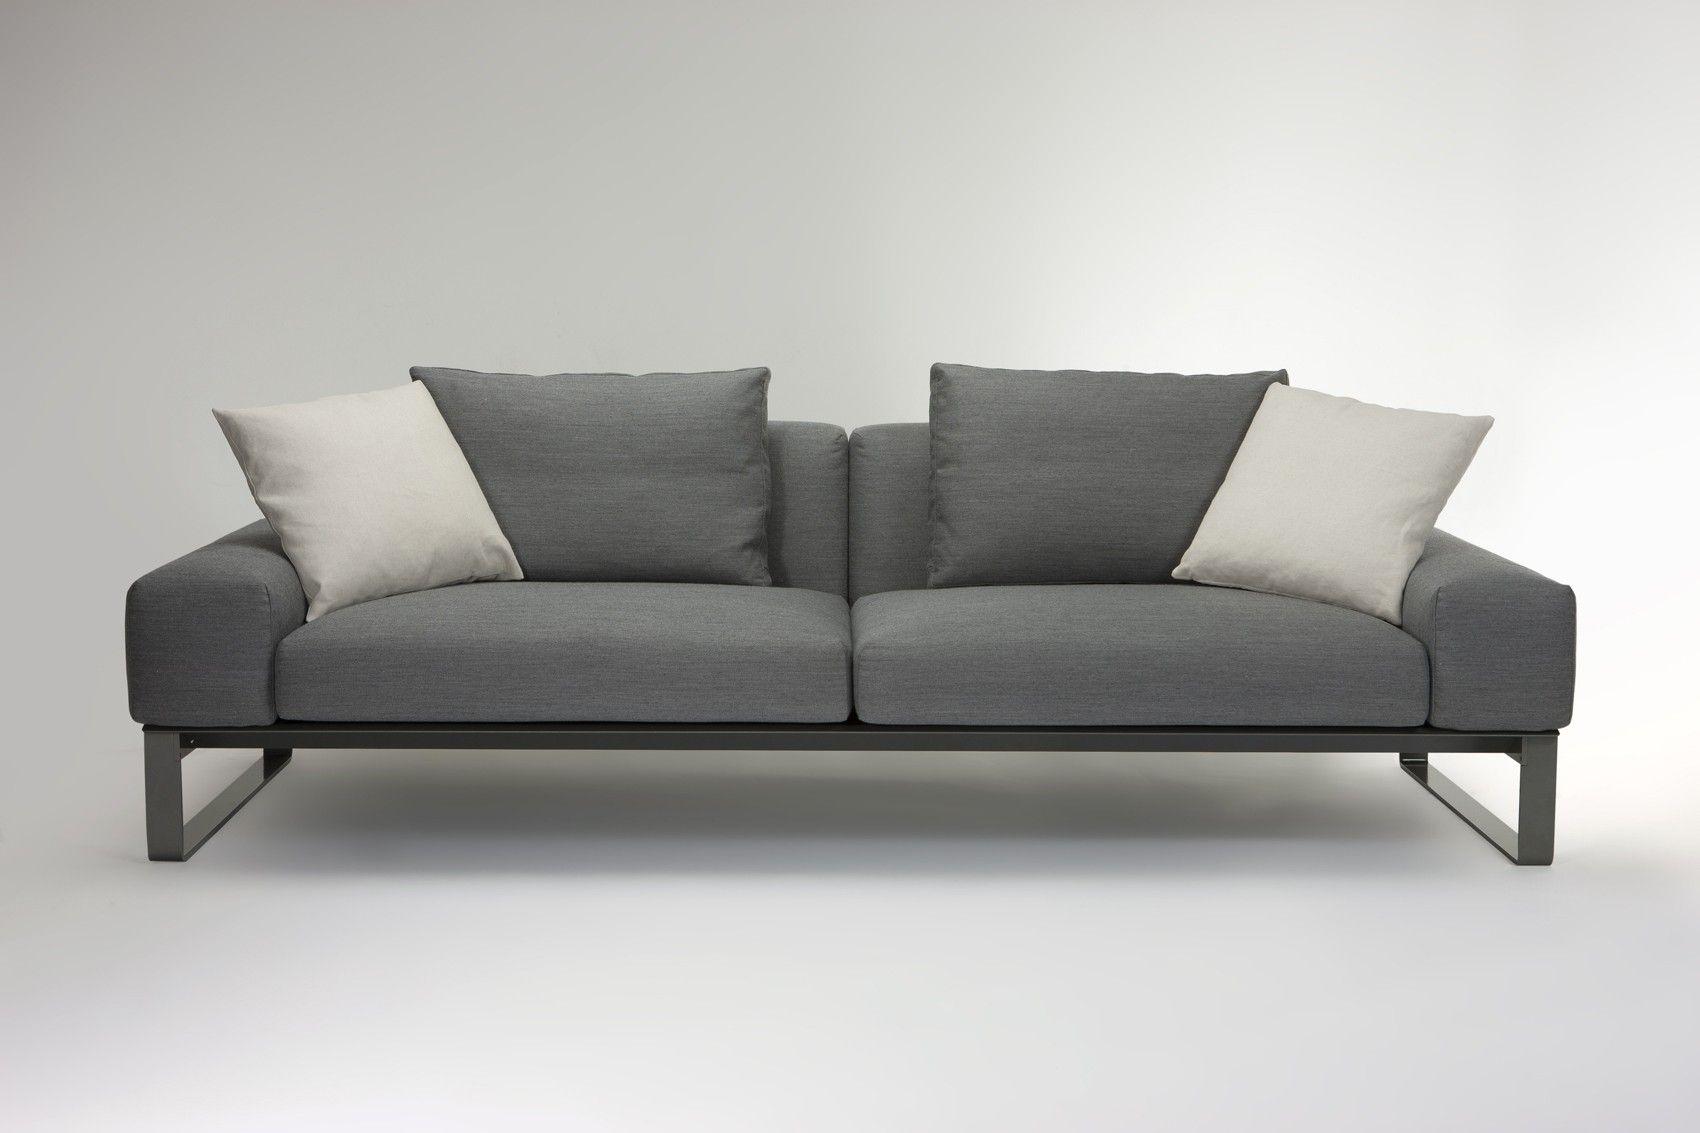 Minotti Ipad White Divani It Interior Design Pinterest  # Muebles Federico Churba